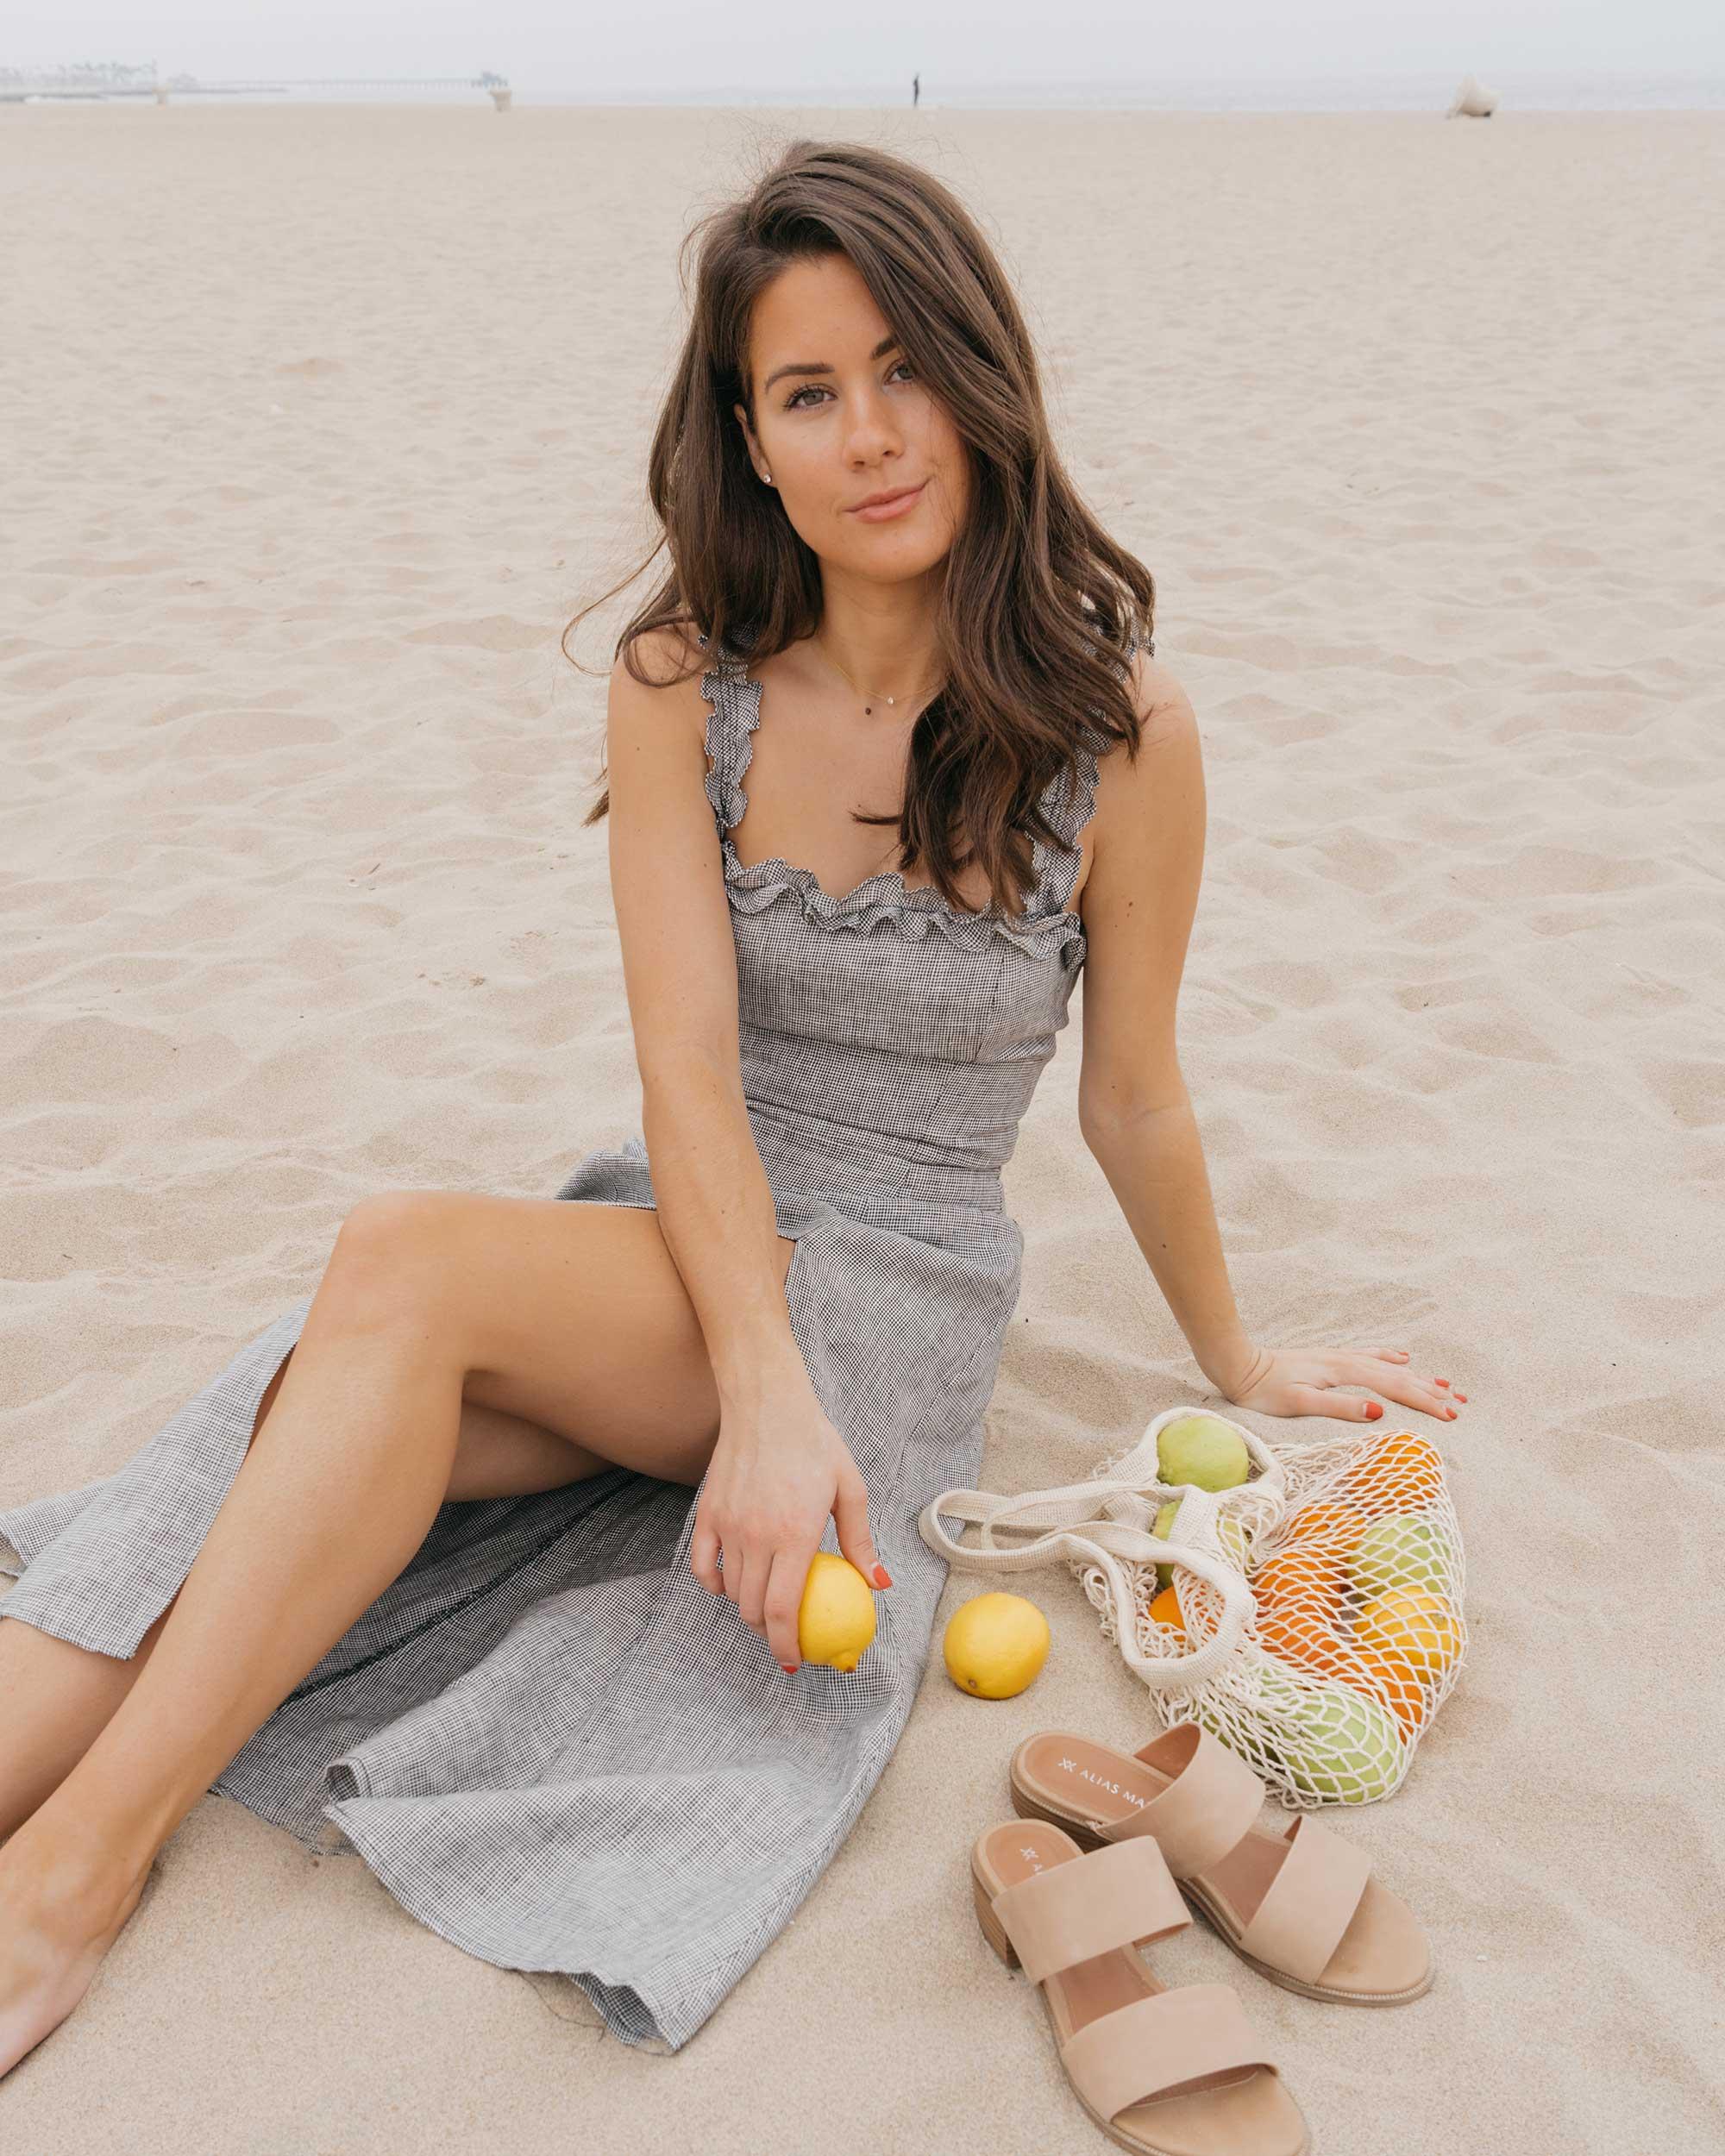 Reformation Lavendar Midi Dress Cotton Net Shopping Tote Newport Beach California Summer Outfit5.jpg